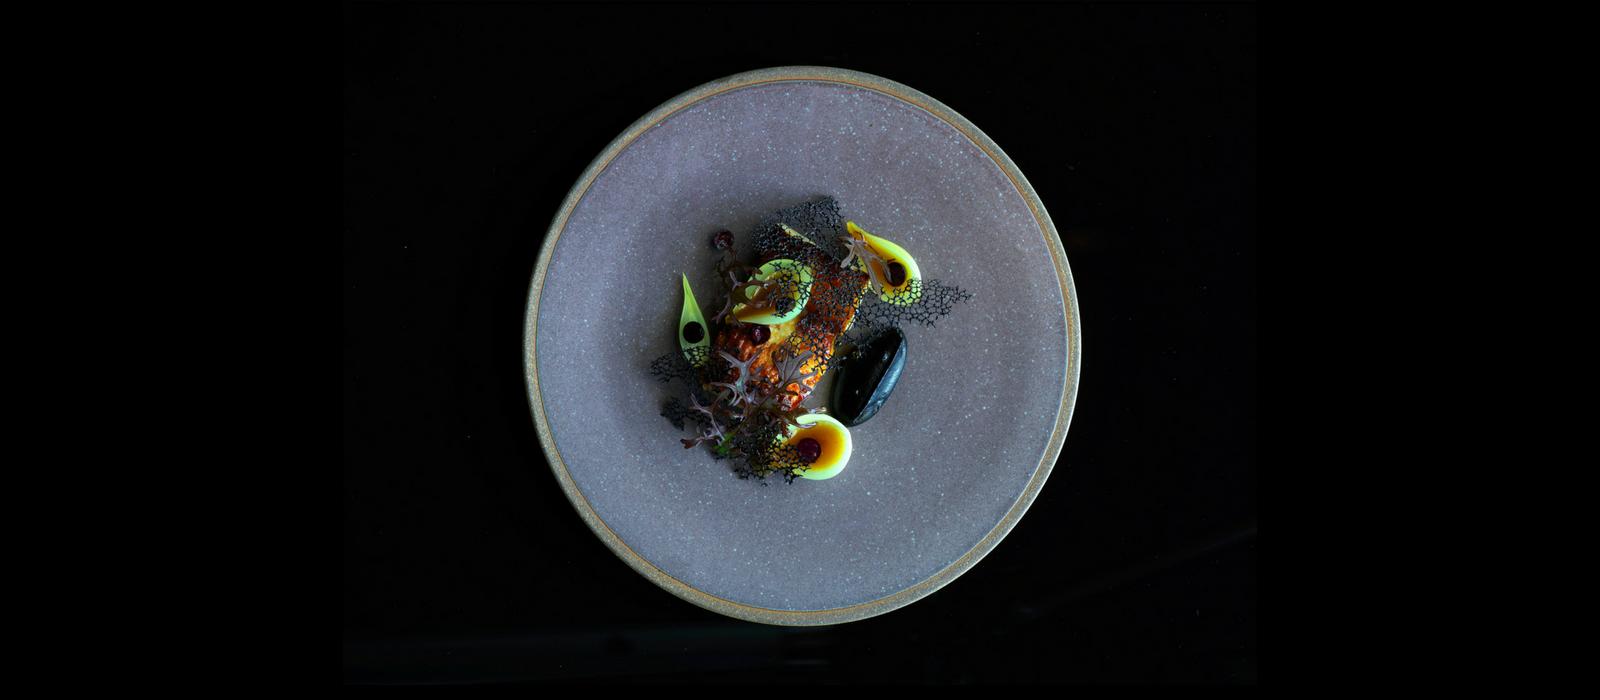 Aubergine. Photo: Jason Loucas